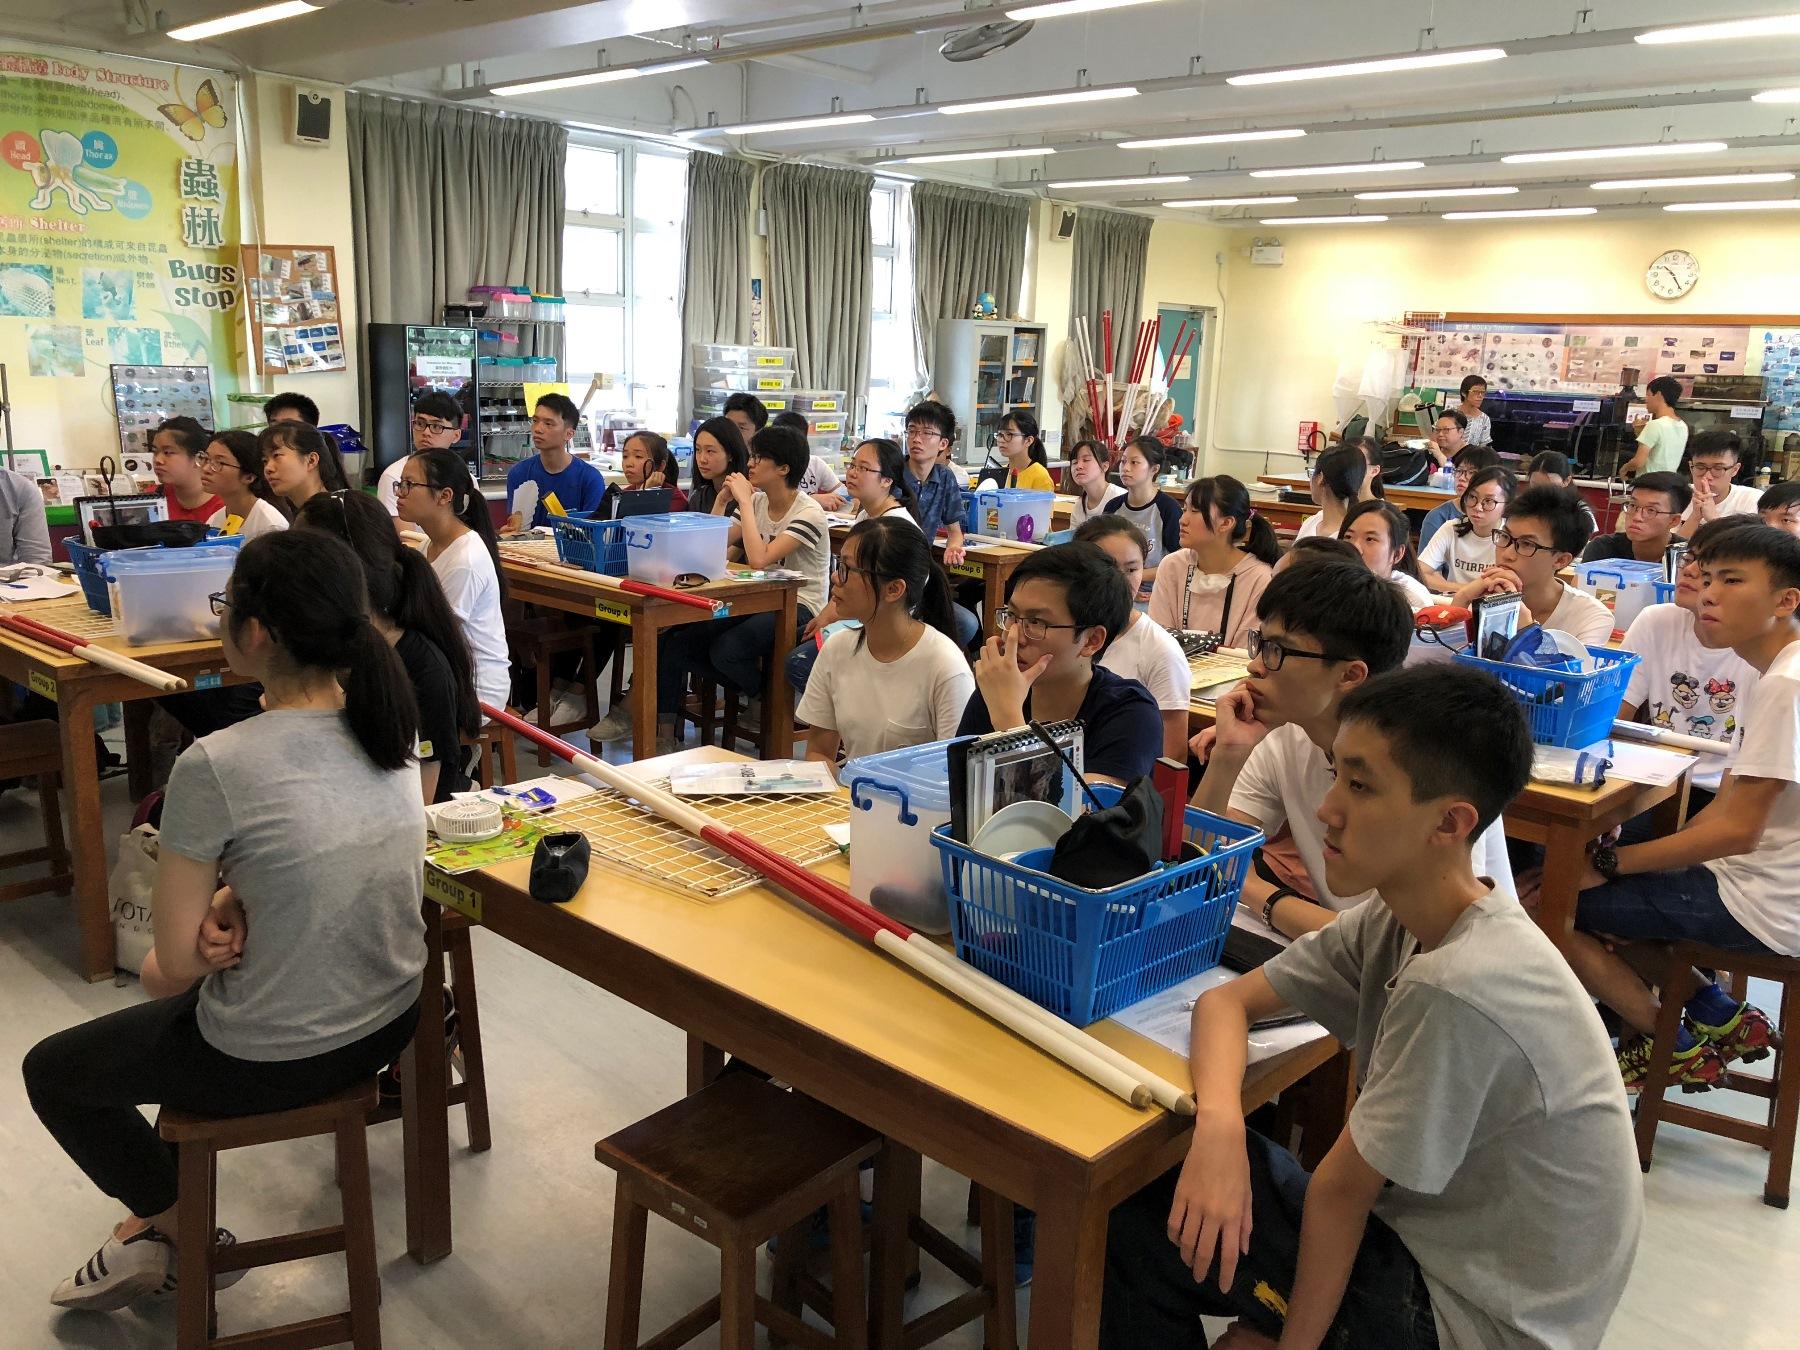 http://www.npc.edu.hk/sites/default/files/2_1337.jpg